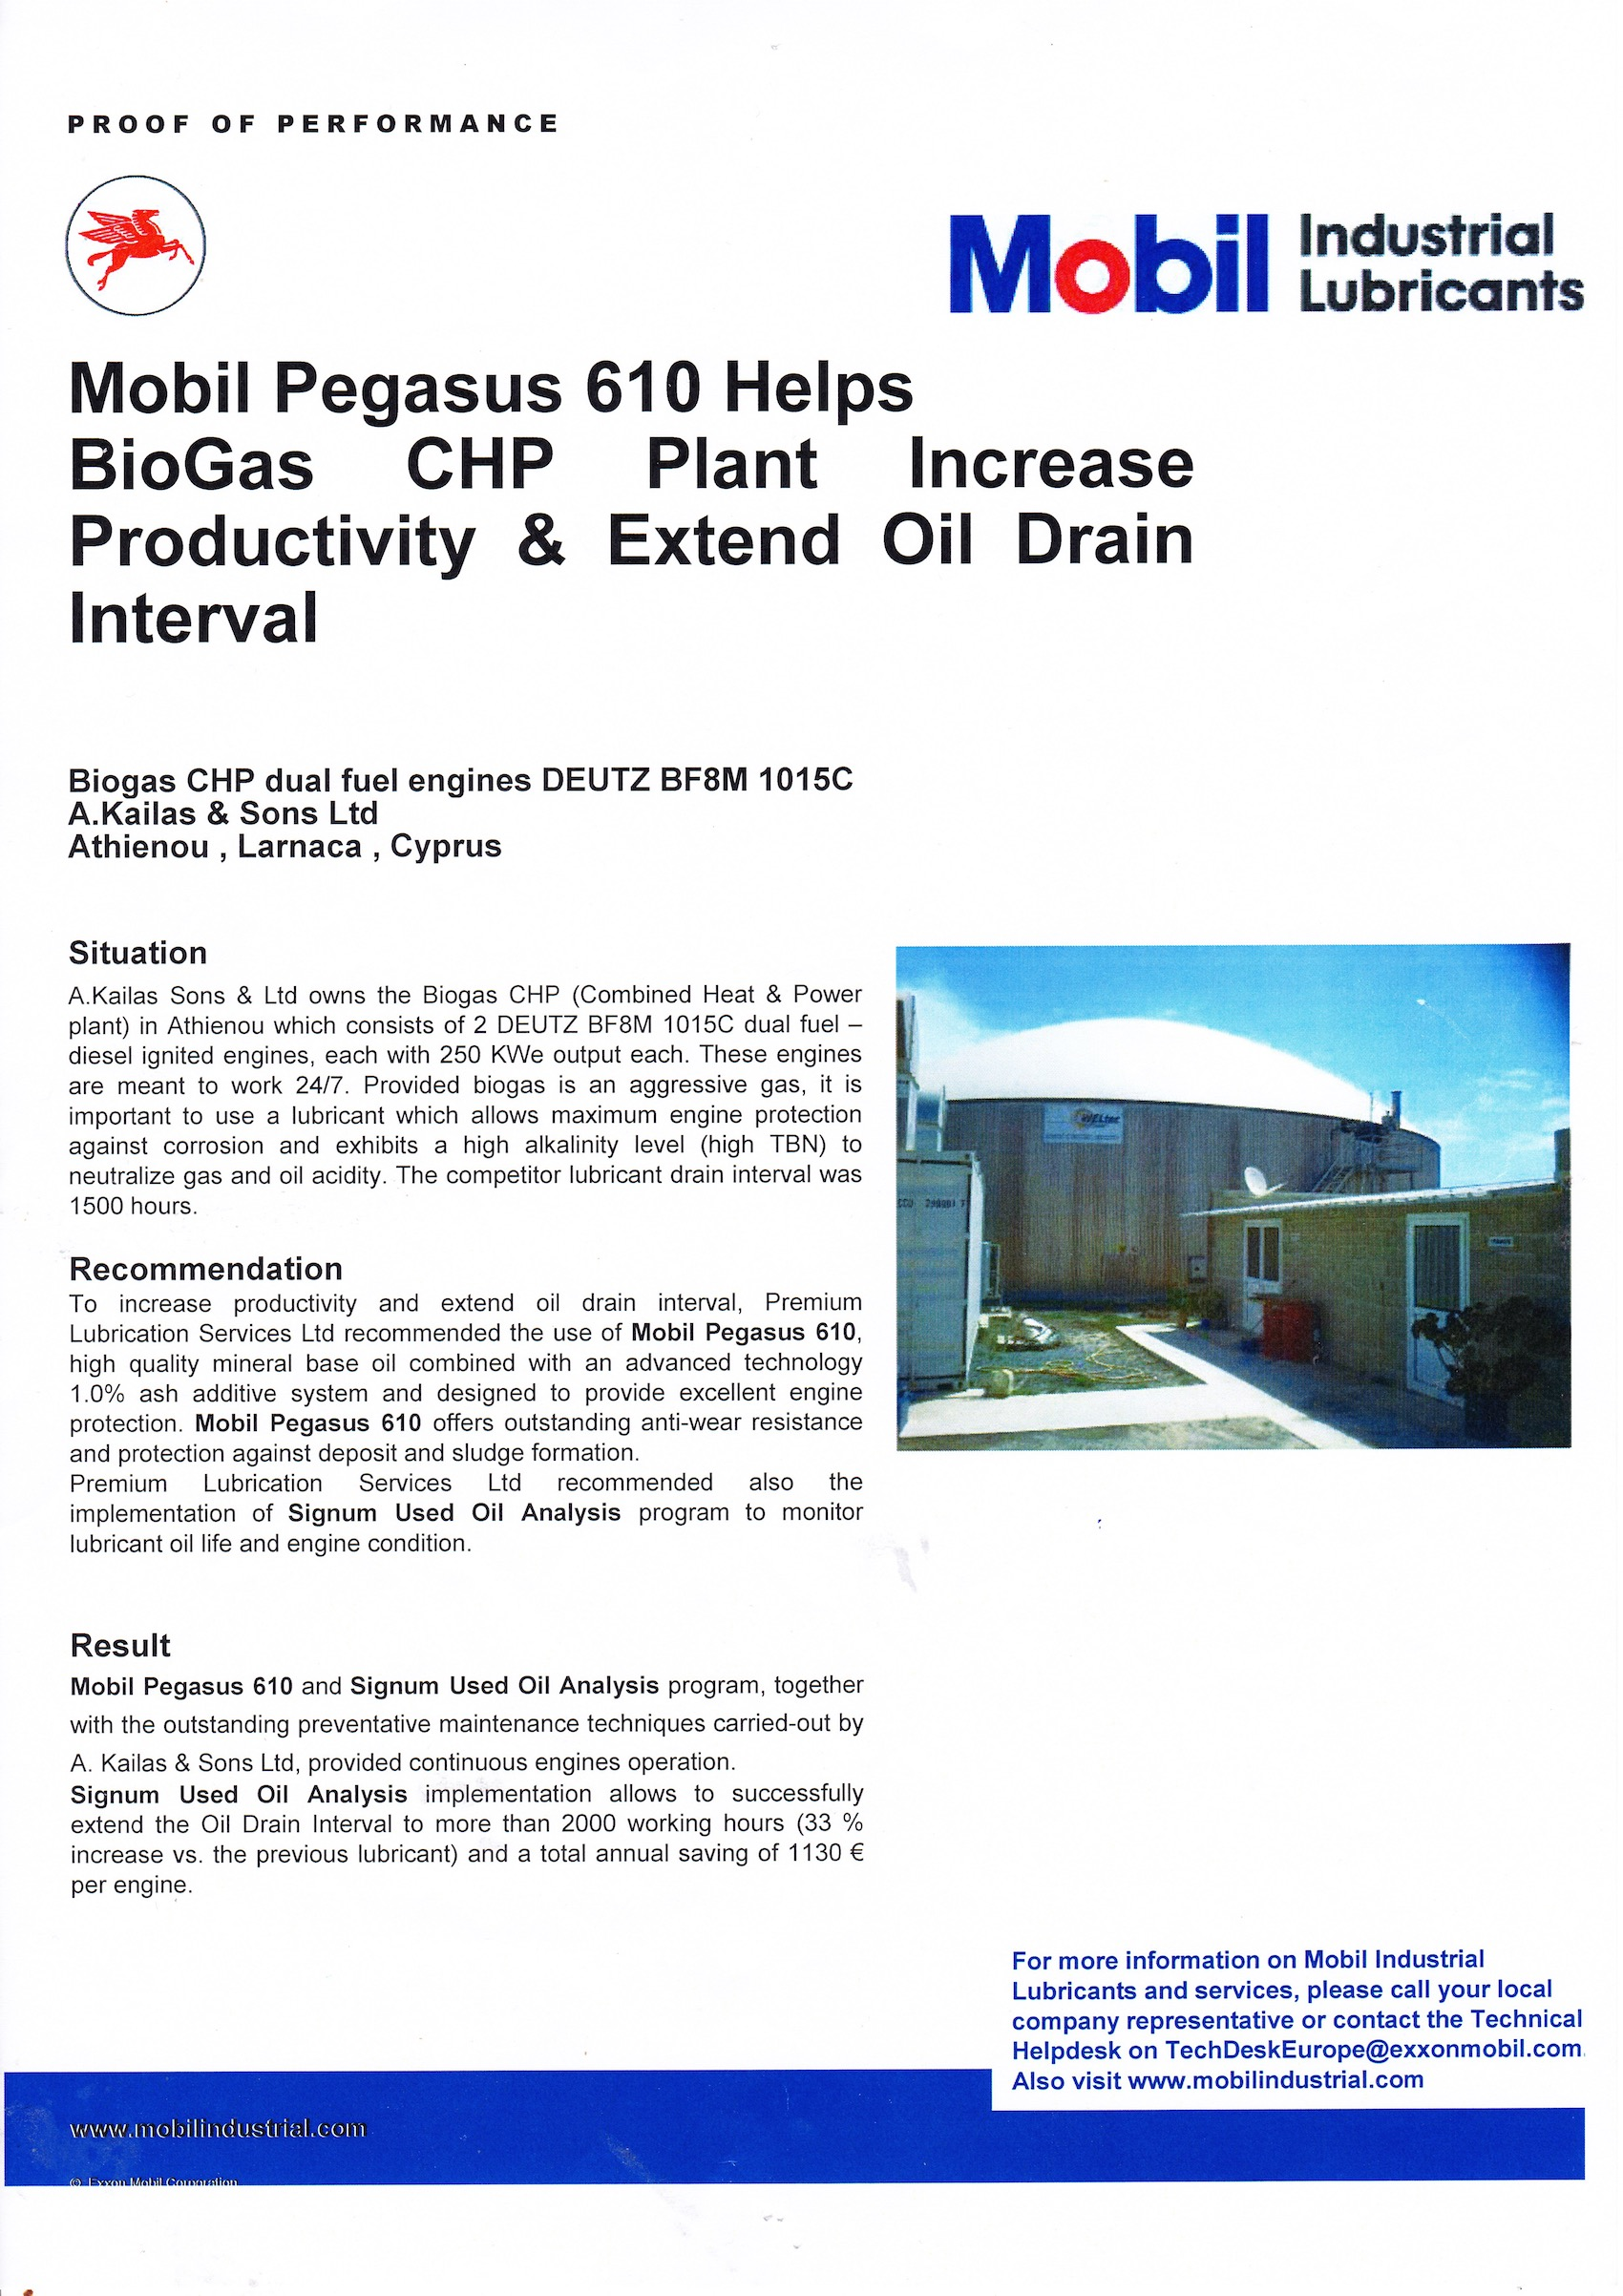 mobil_award_akailas_biogas